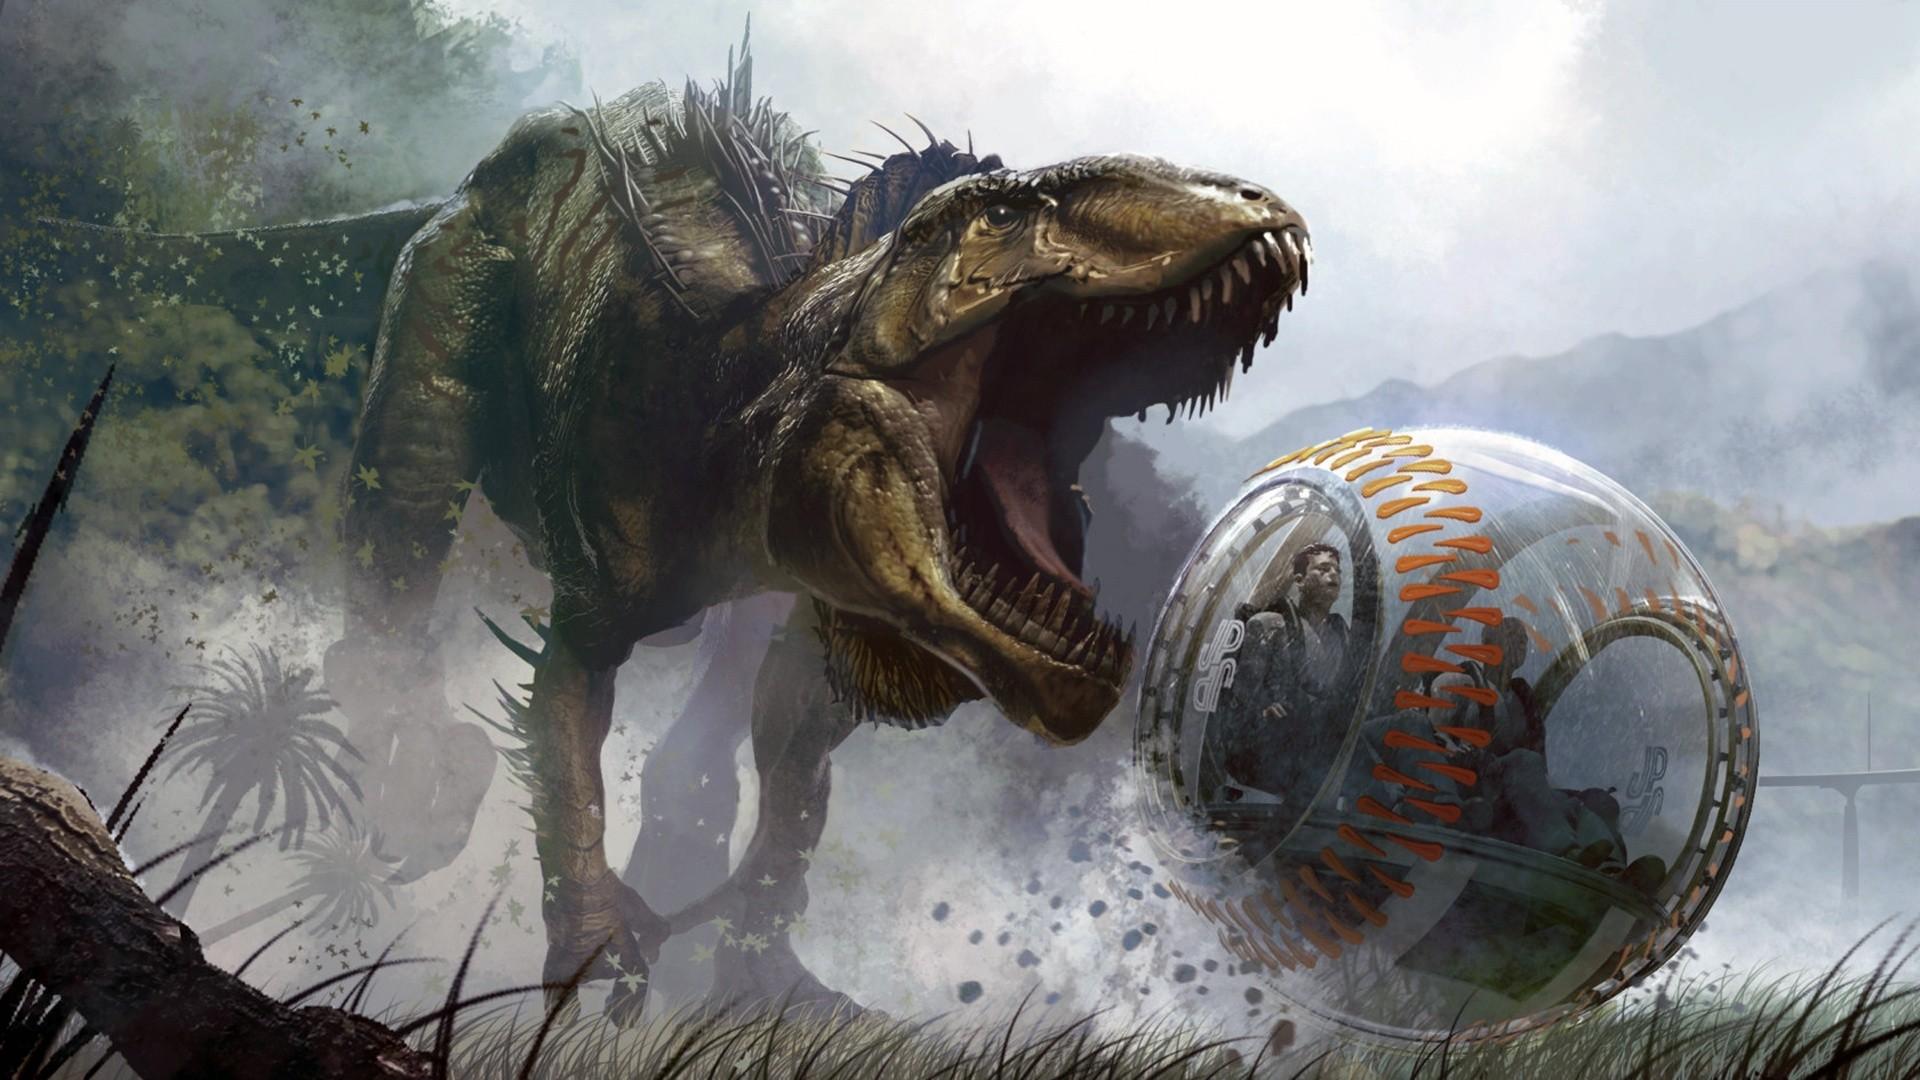 Jurassic World hd desktop wallpaper